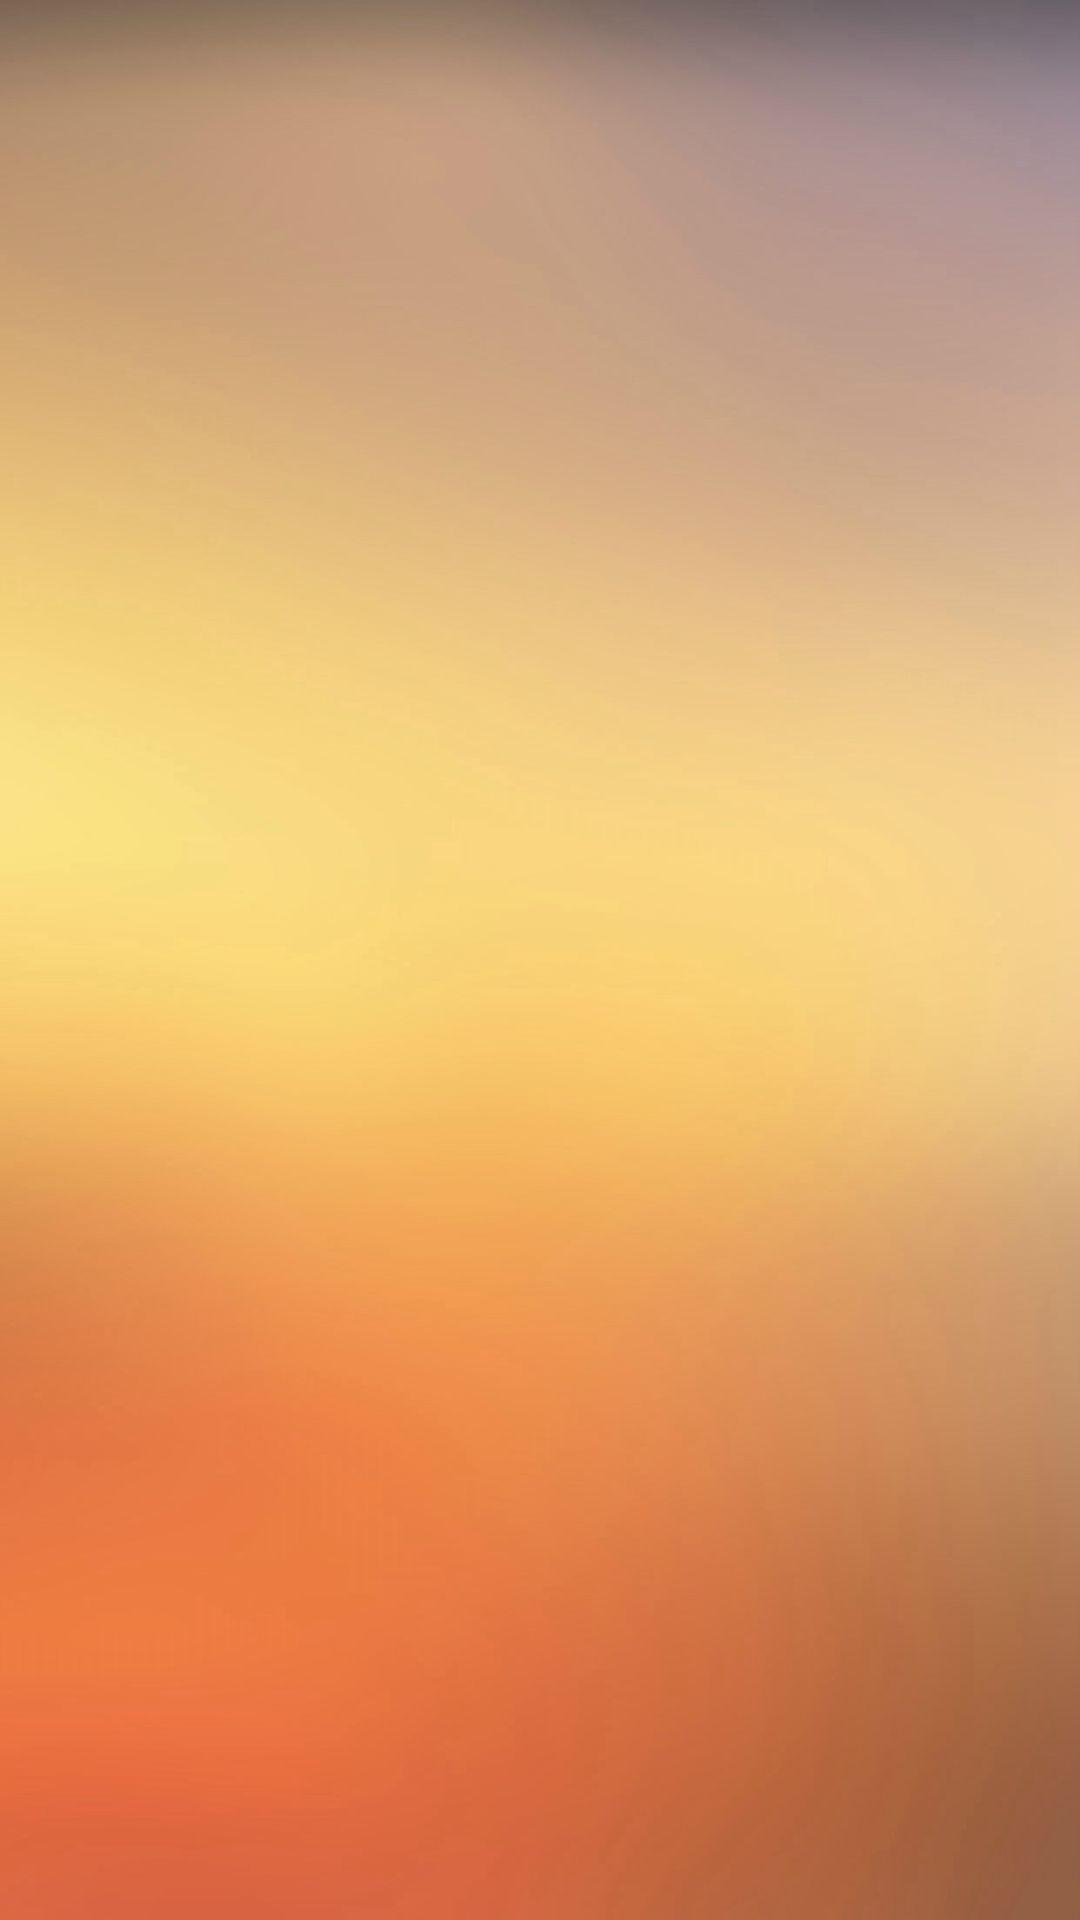 Sunset Fire Gradation Blur Iphone 6 Plus Wallpaper In